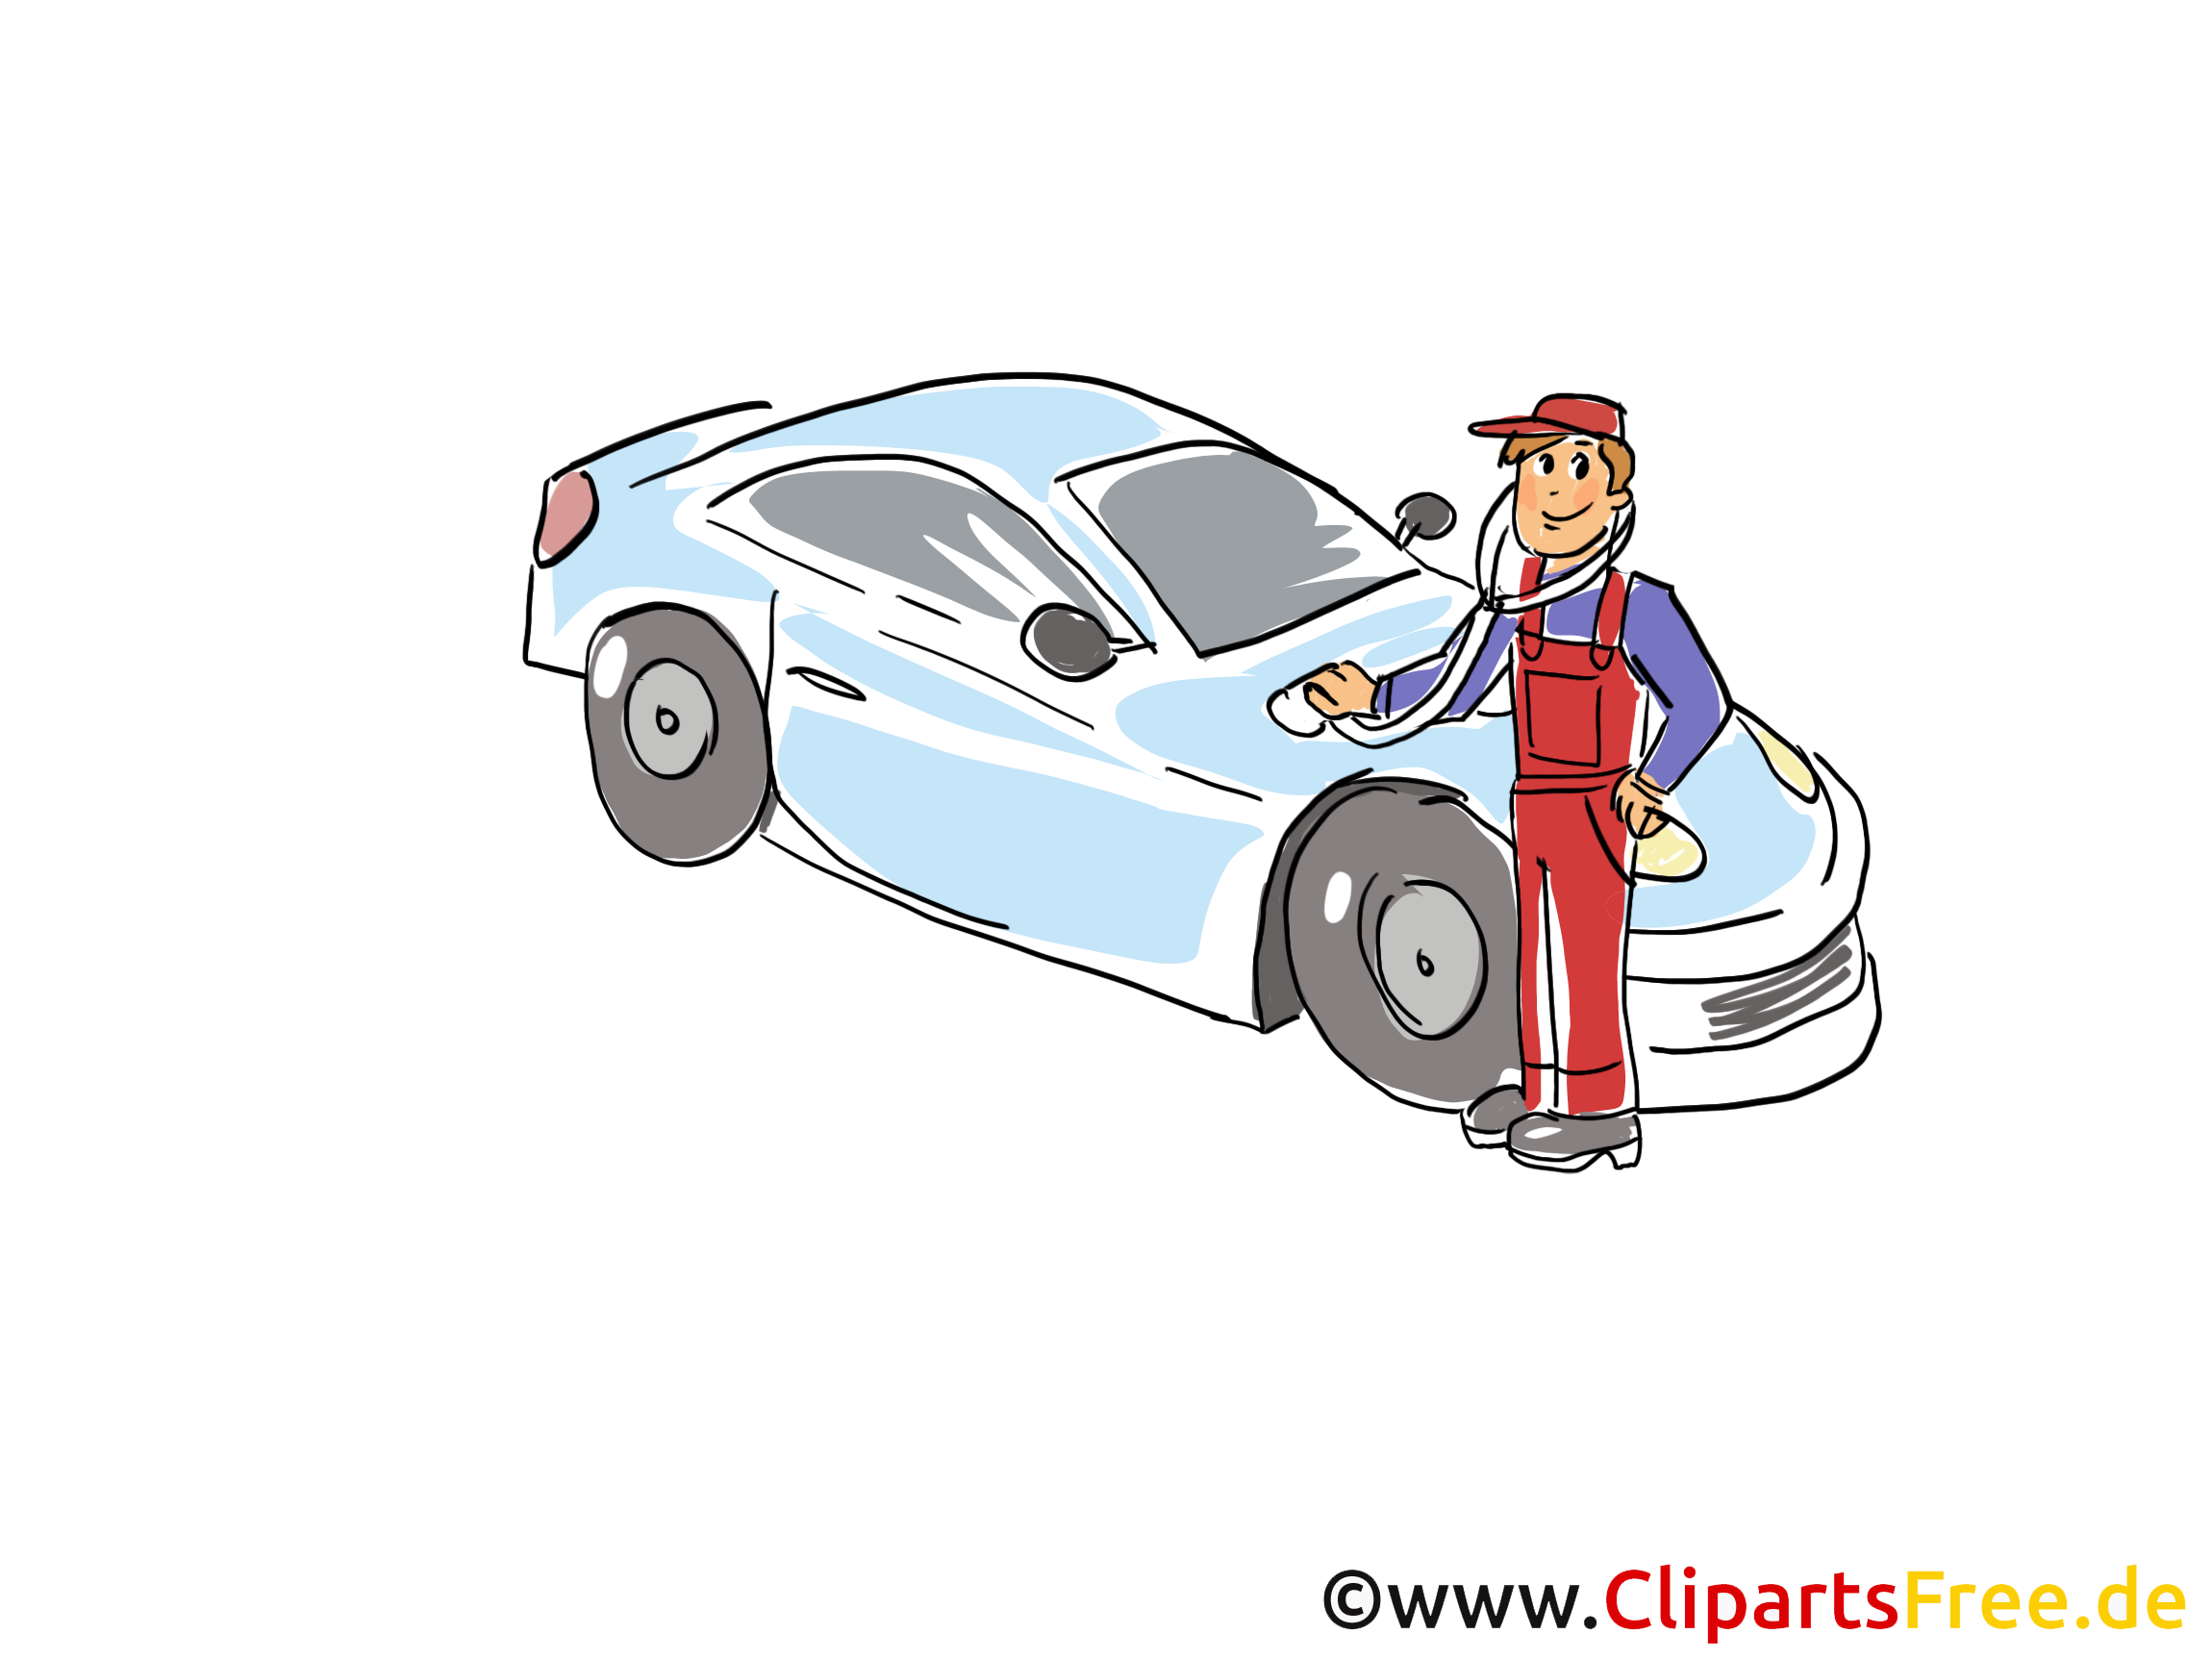 Kfz-Diagnose Clipart, Bild, Grafik, Cartoon, Illustration gratis